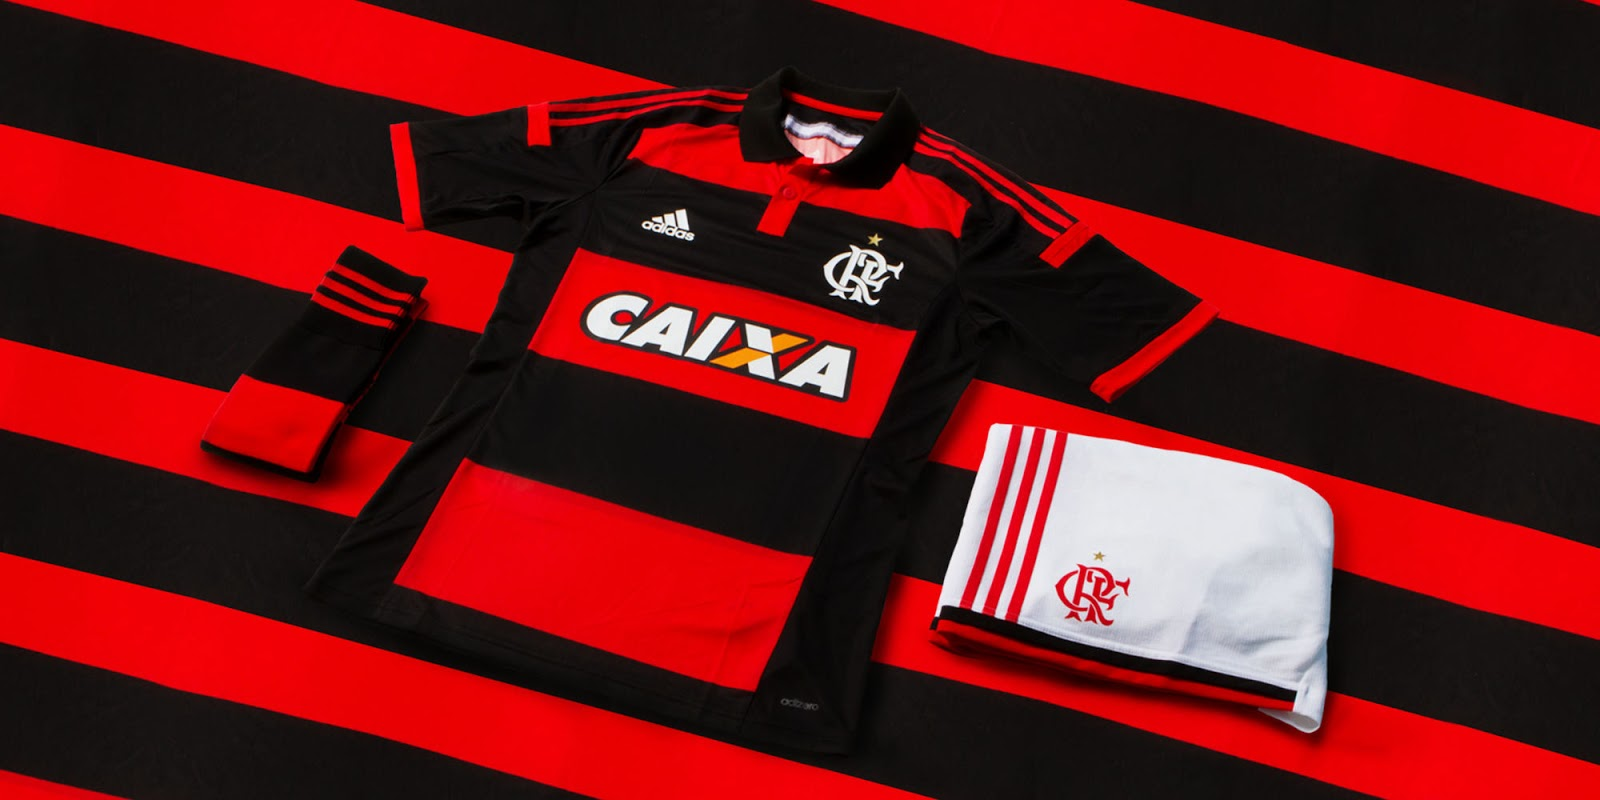 29e0e2ad0 Discount Flamengo 2014 Home Kit Unveiled